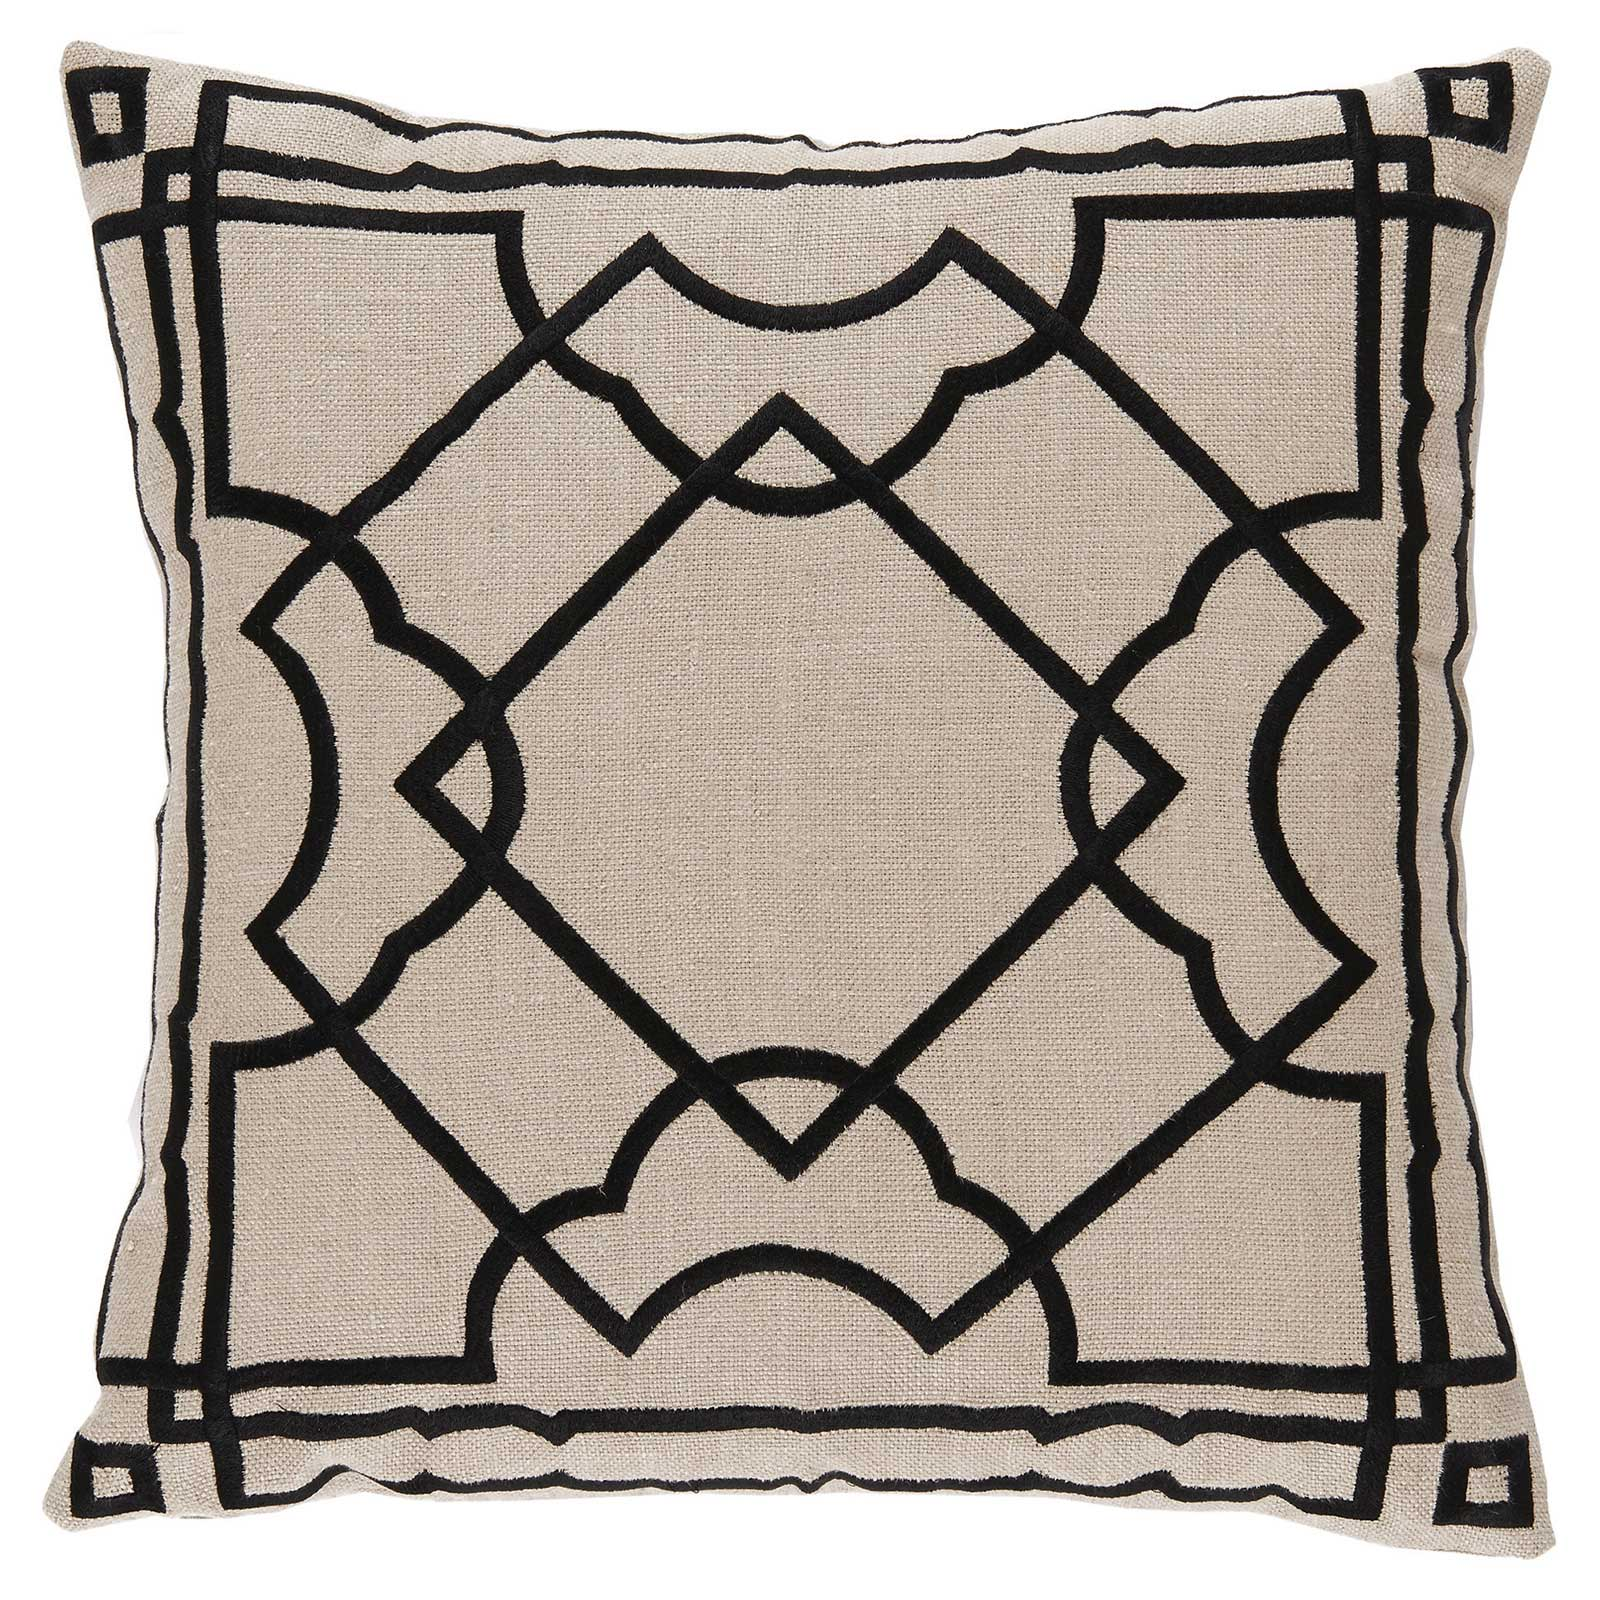 Cugat Modern Deco Black Embroidered Beige Pillow - 20x20